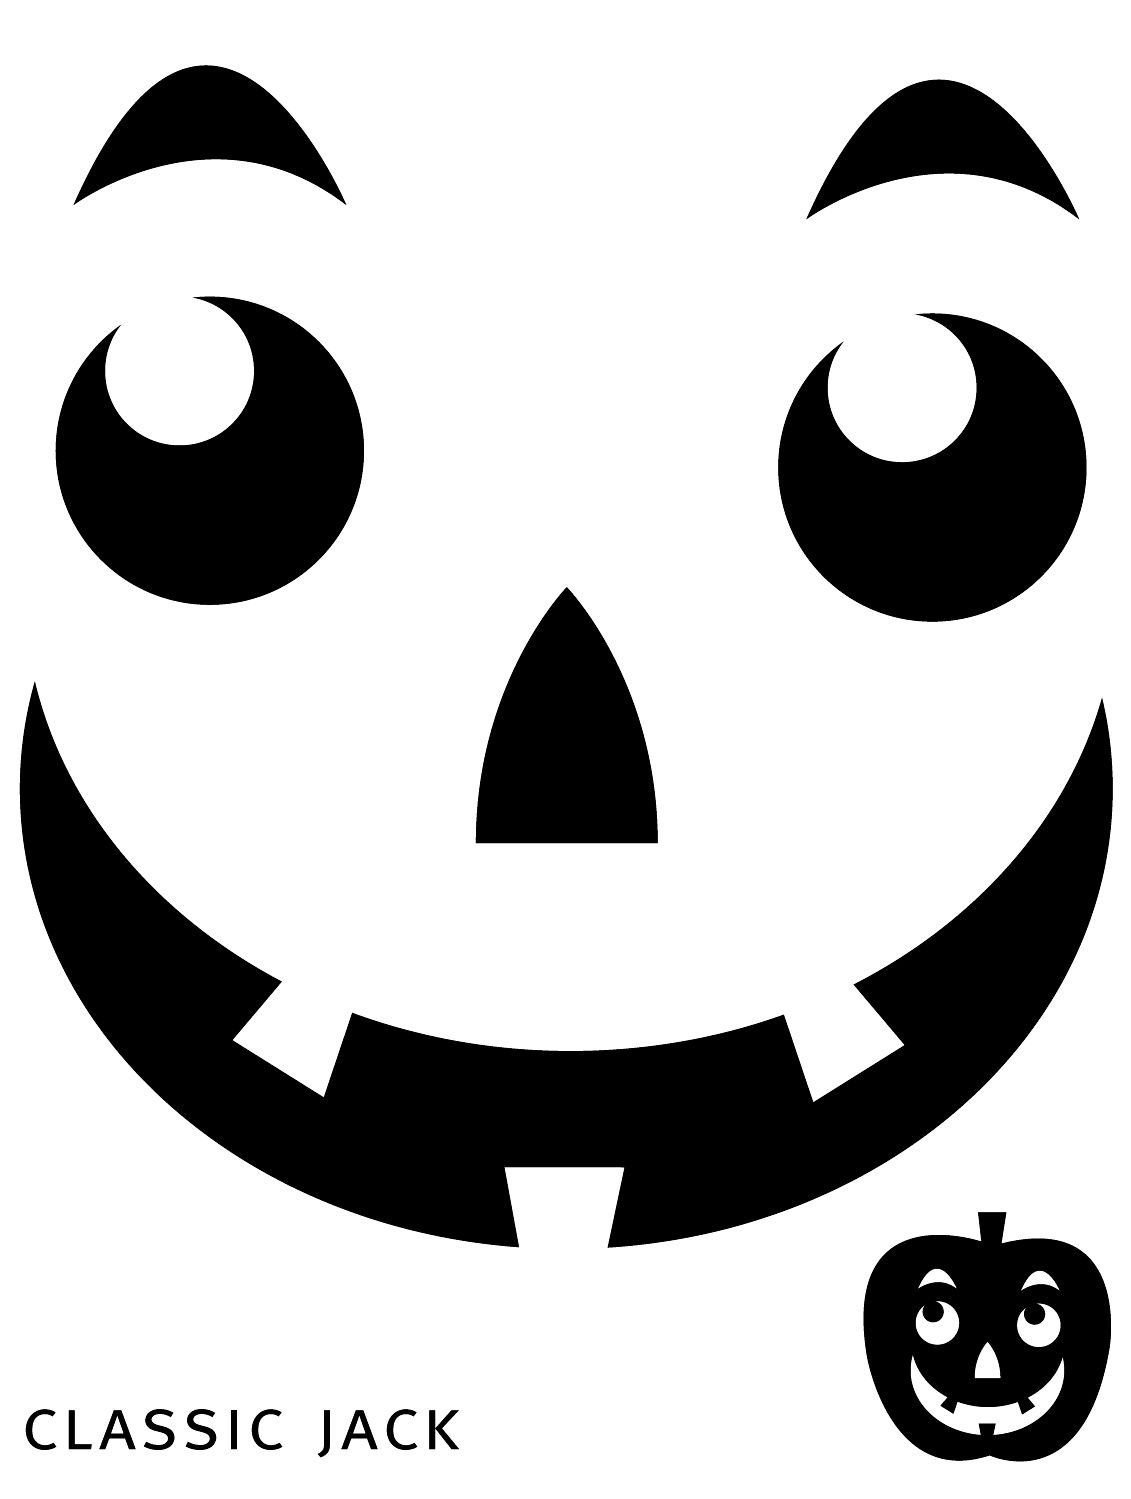 Image Result For Printable Pumpkin Carving Stencils | Pumpkin - Pumpkin Carving Patterns Free Printable